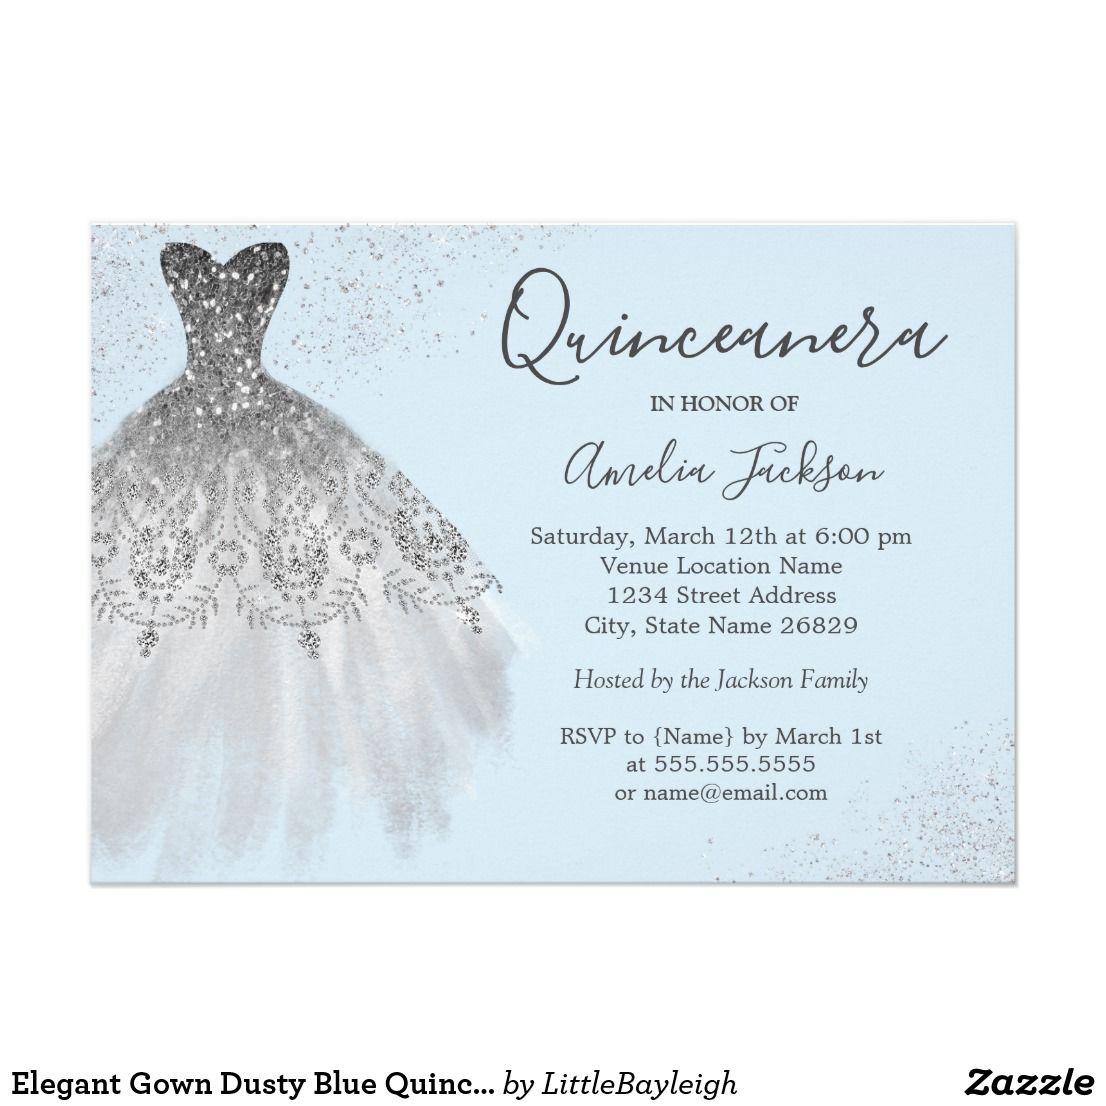 Elegant Gown Dusty Blue Quinceanera Invitation Zazzle